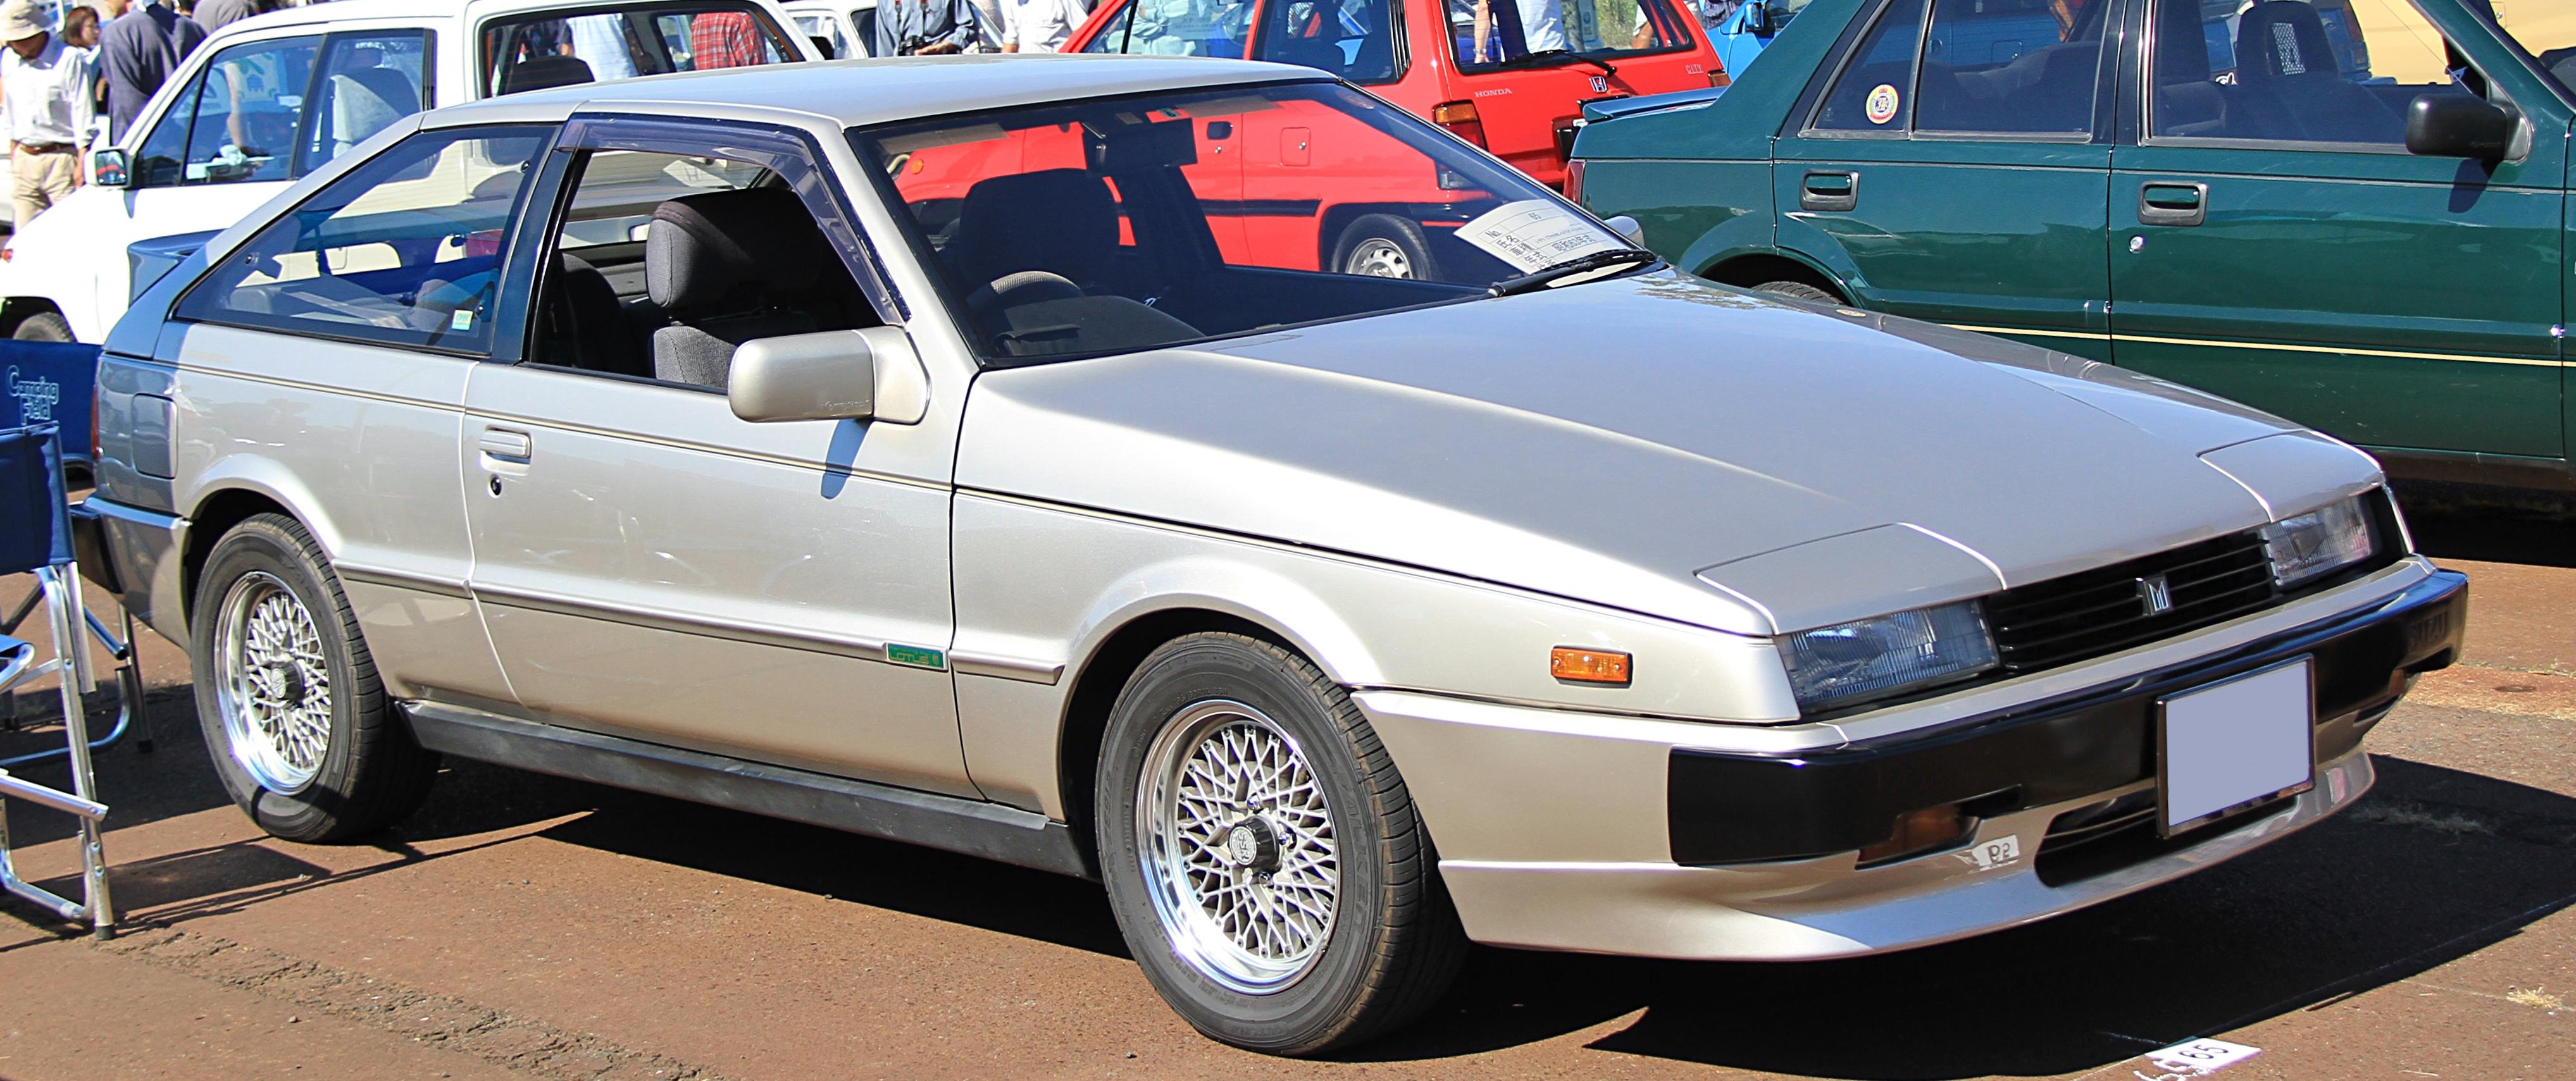 File 1988 Isuzu Piazza Xe Handling By Lotus Jpg